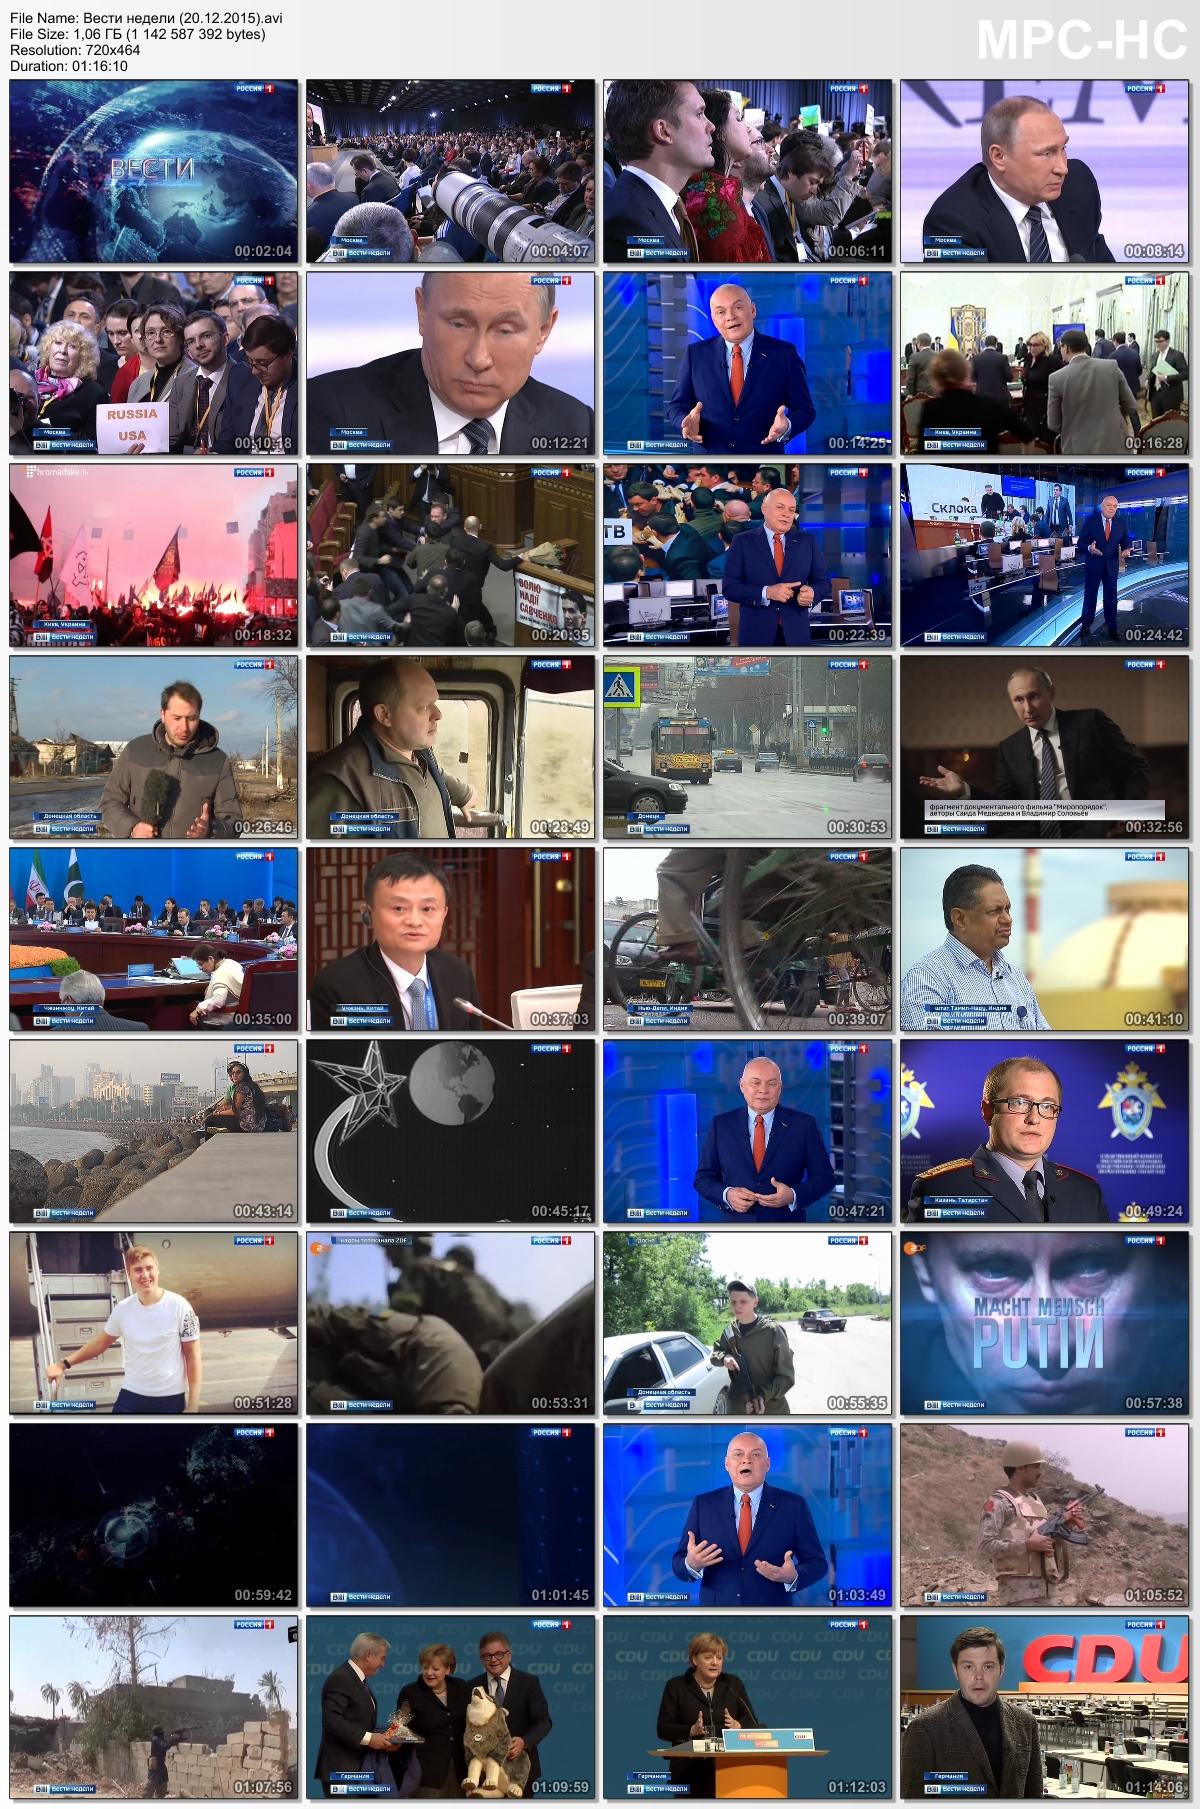 http://i67.fastpic.ru/big/2015/1221/04/3fd1a744ae1c558ac66fdc9b85ab8804.jpg